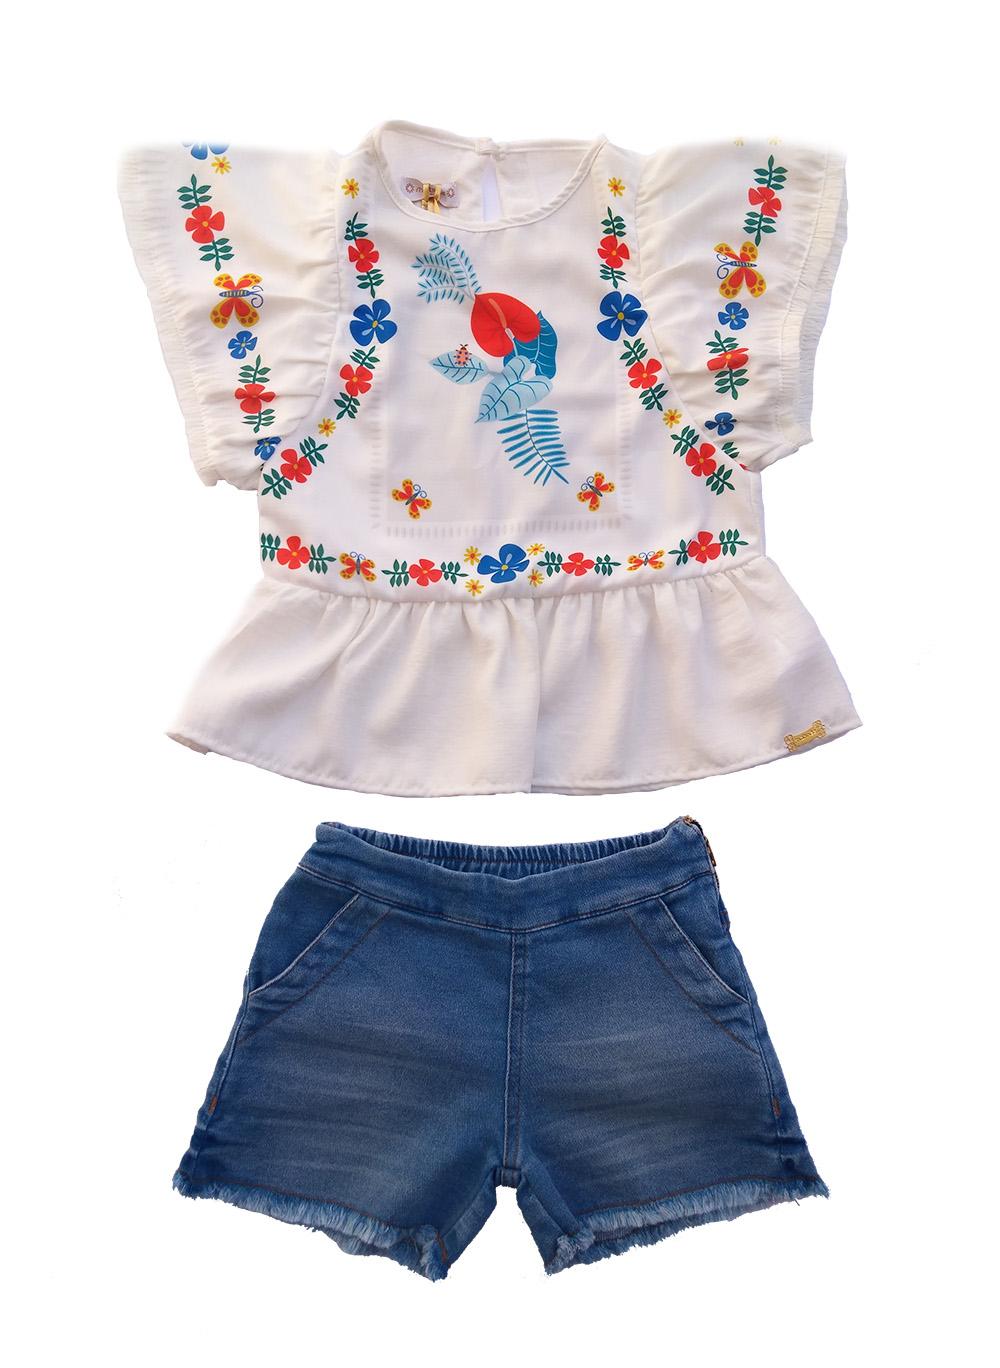 Conjunto Infantil Feminino Blusa Branca e Shorts Jeans